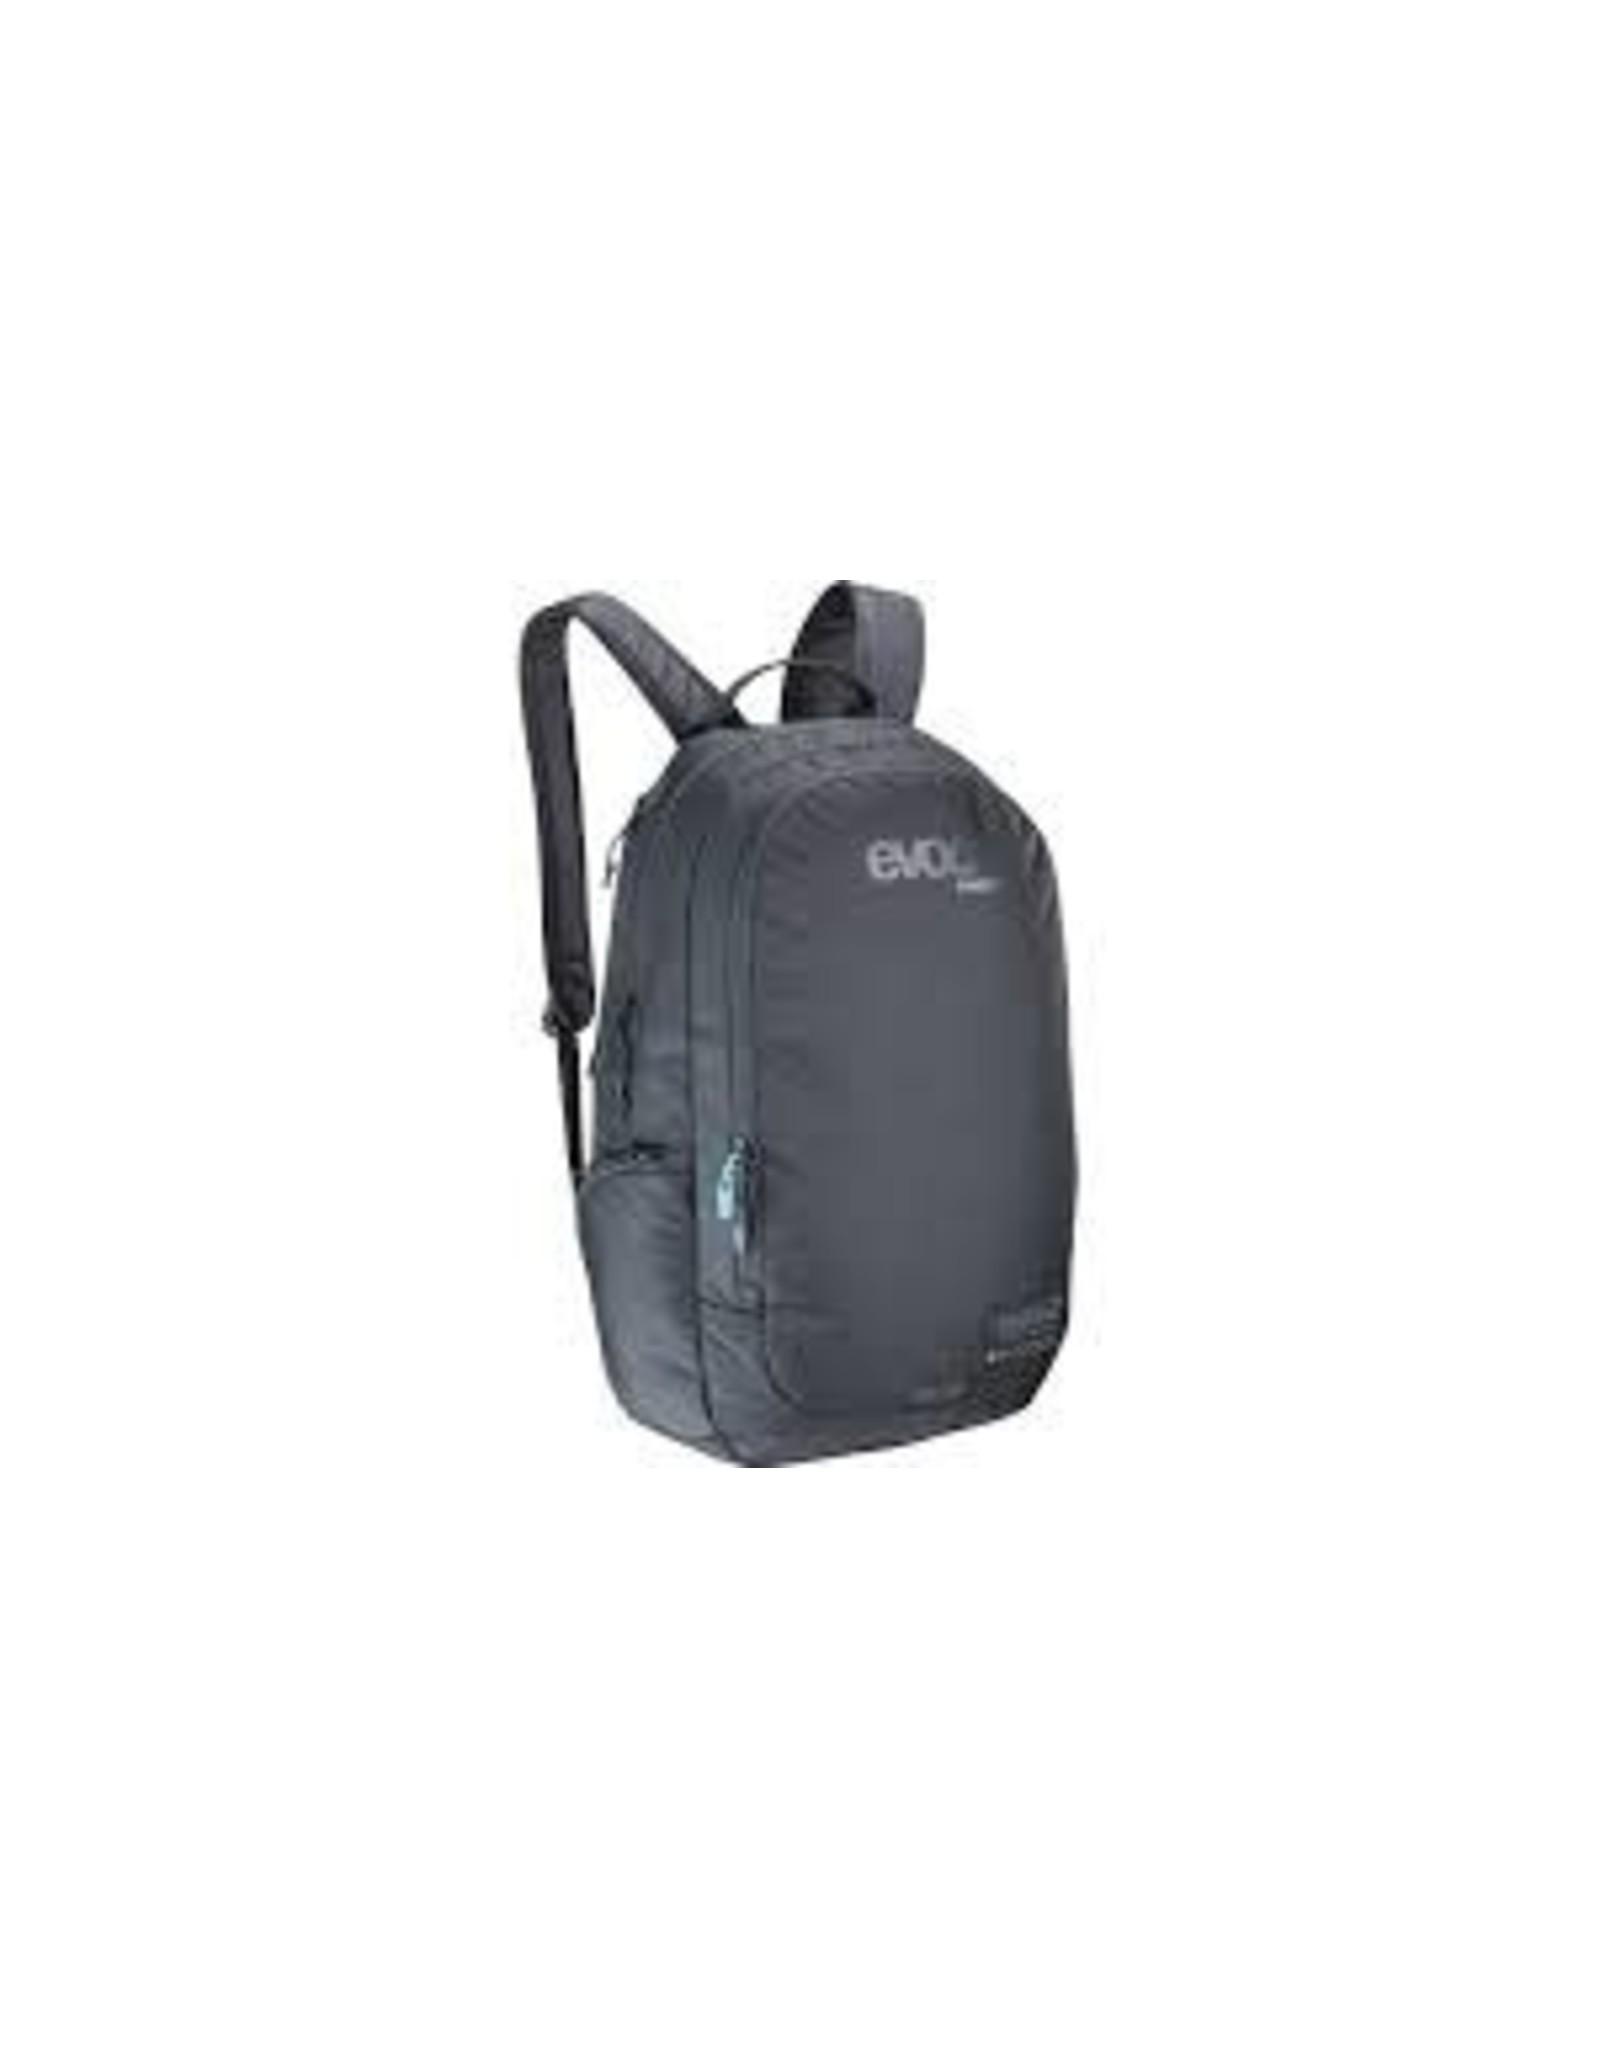 EVOC EVOC - Street  25L Backpack Black